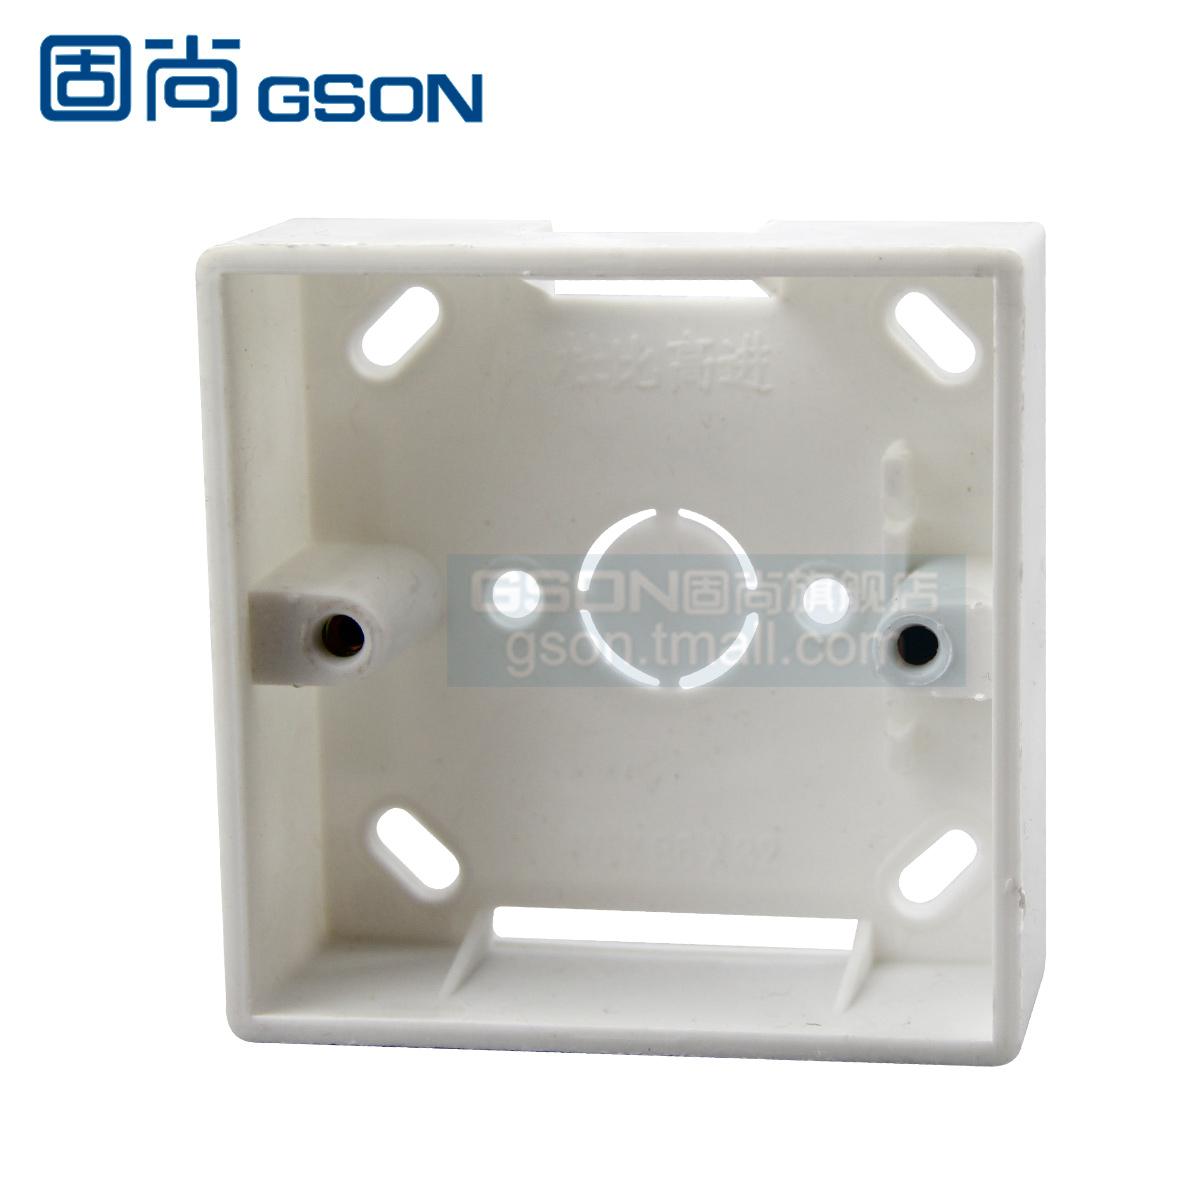 gson电子门禁系统GSON-705